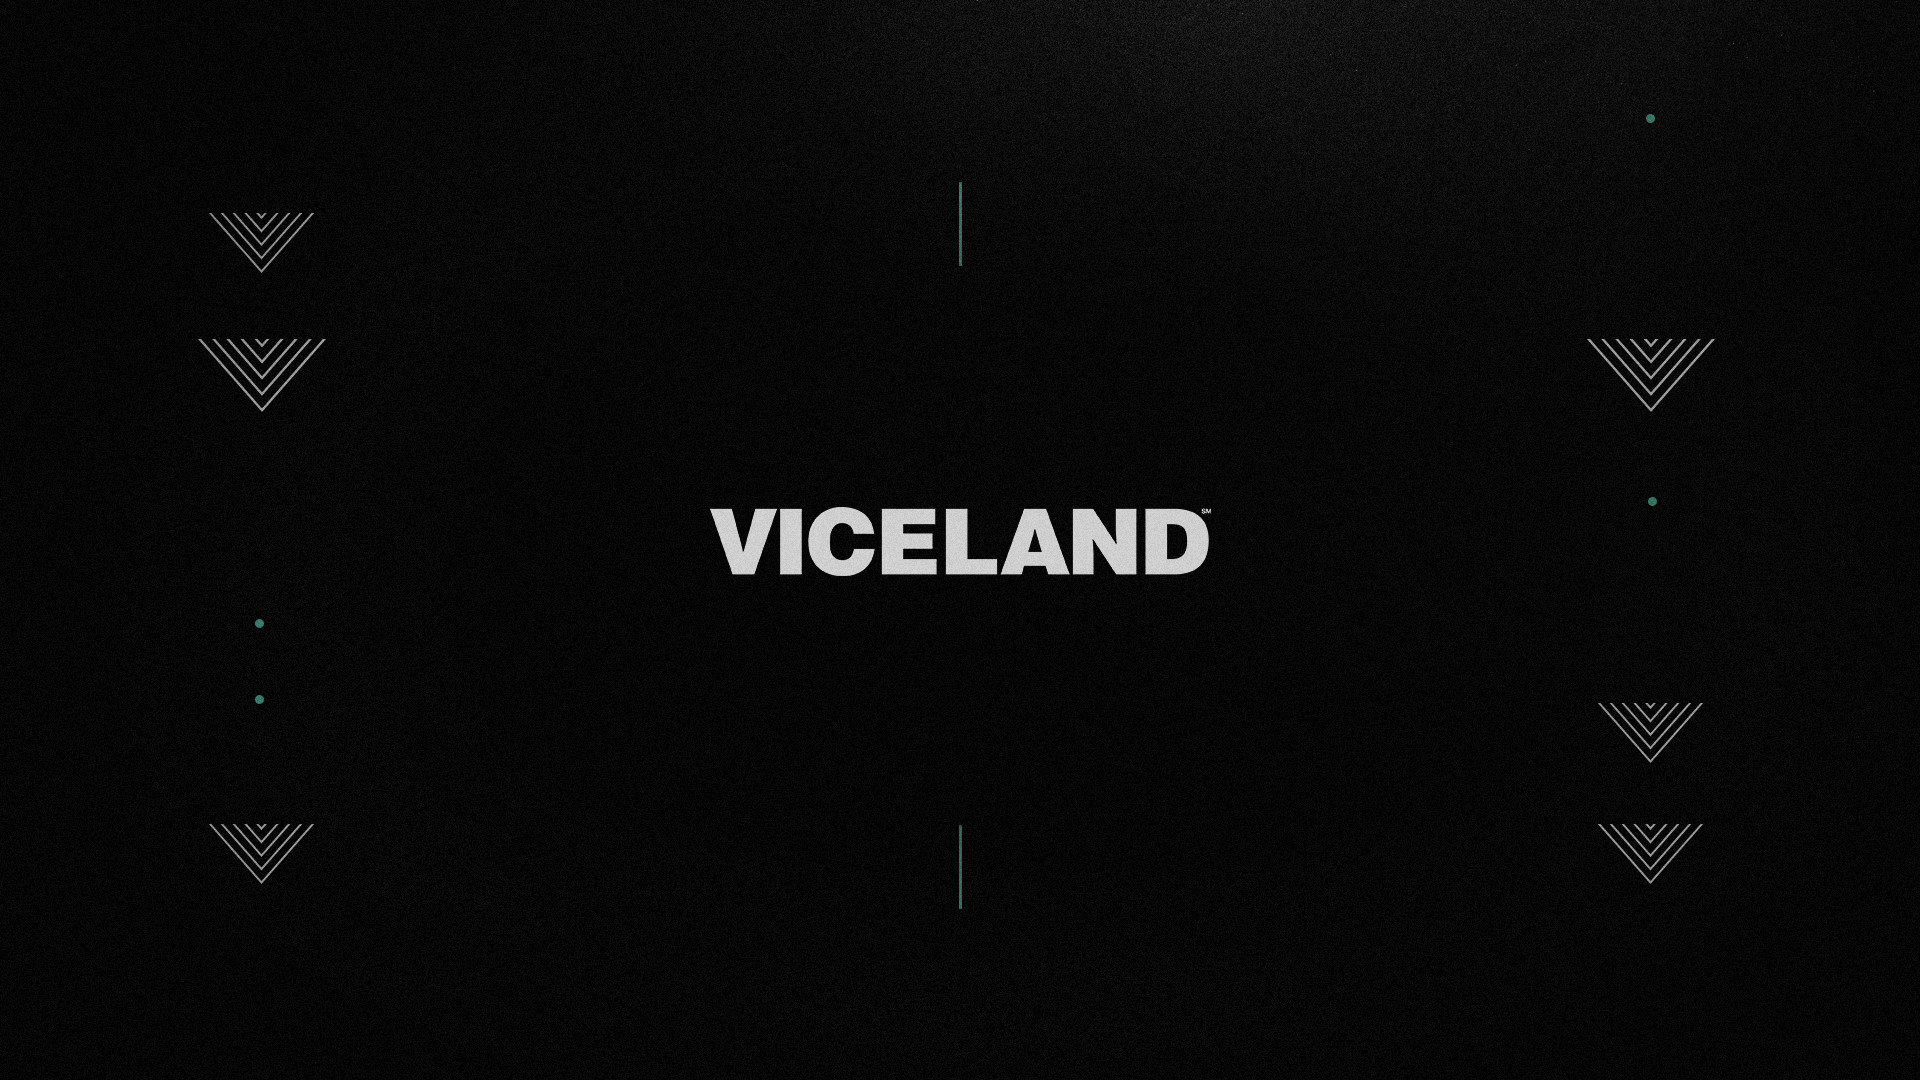 A+E_Upfront_ViceLand_01_titlecard.jpg